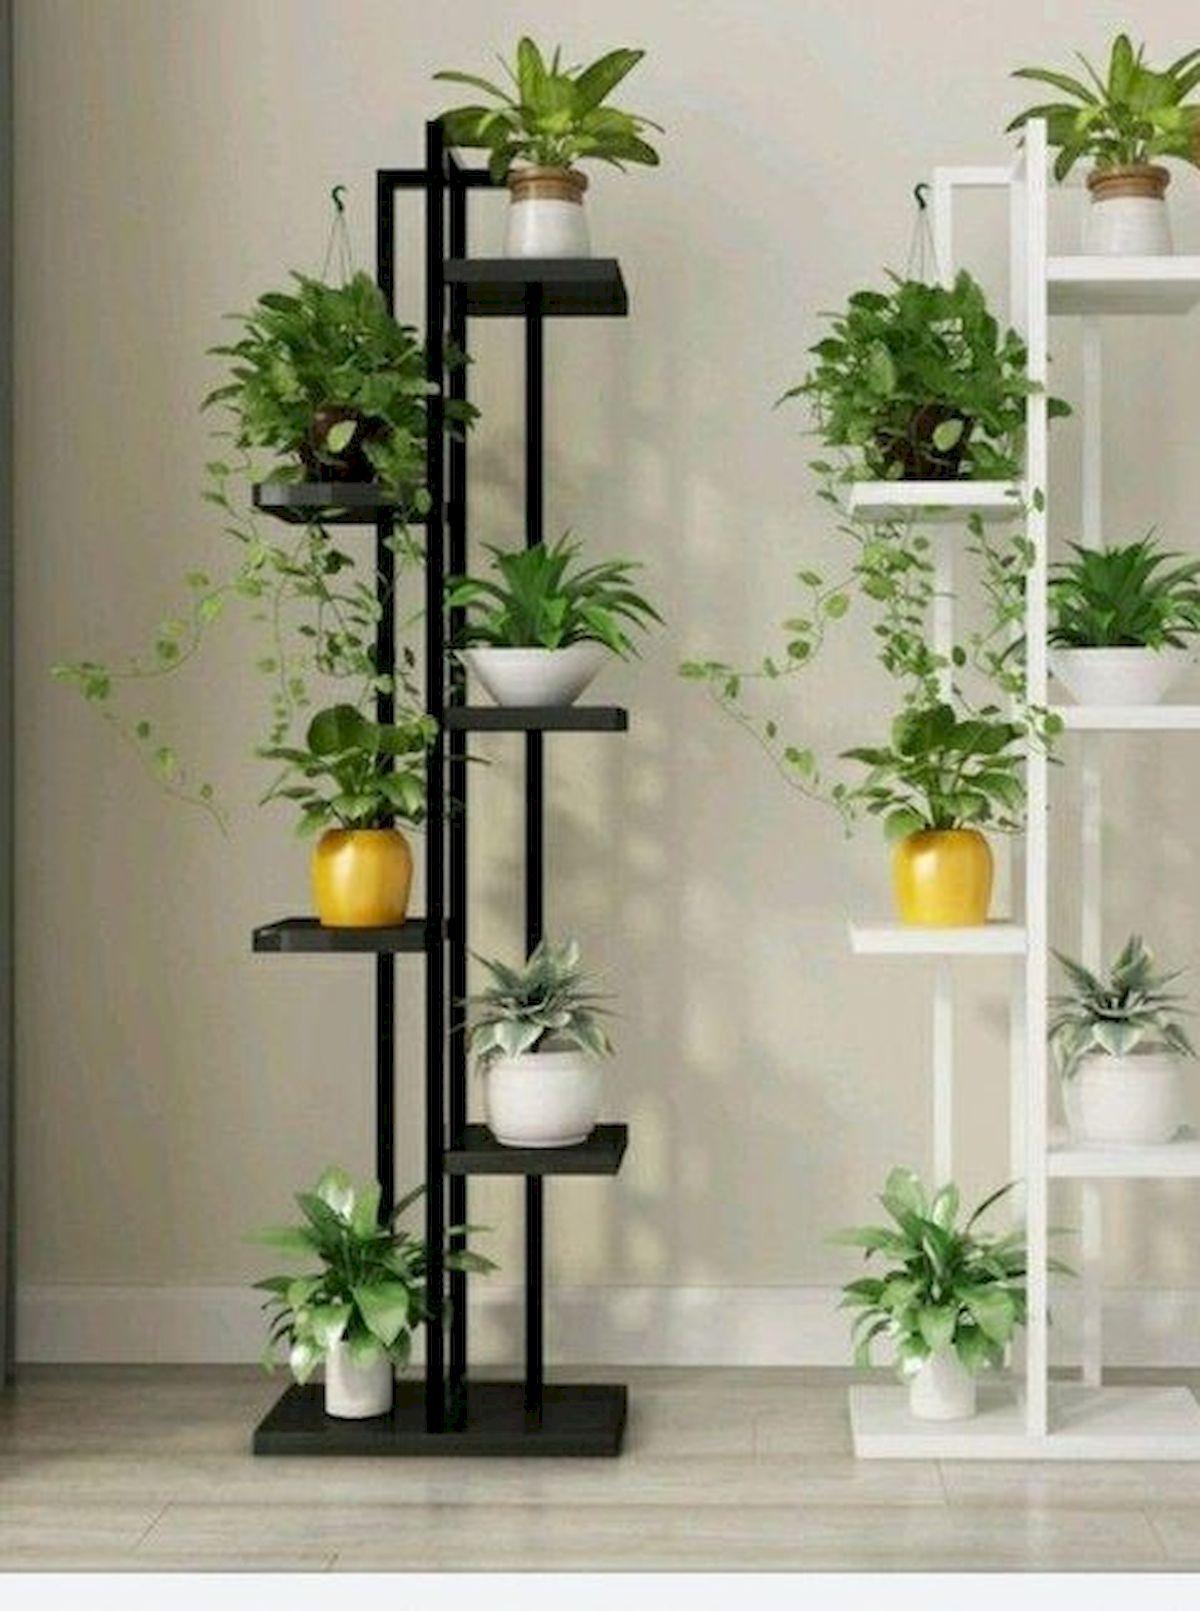 33 Stunning Herb Garden Design Ideas And Remodel 33decor Plant Decor House Plants Decor Interior Plants